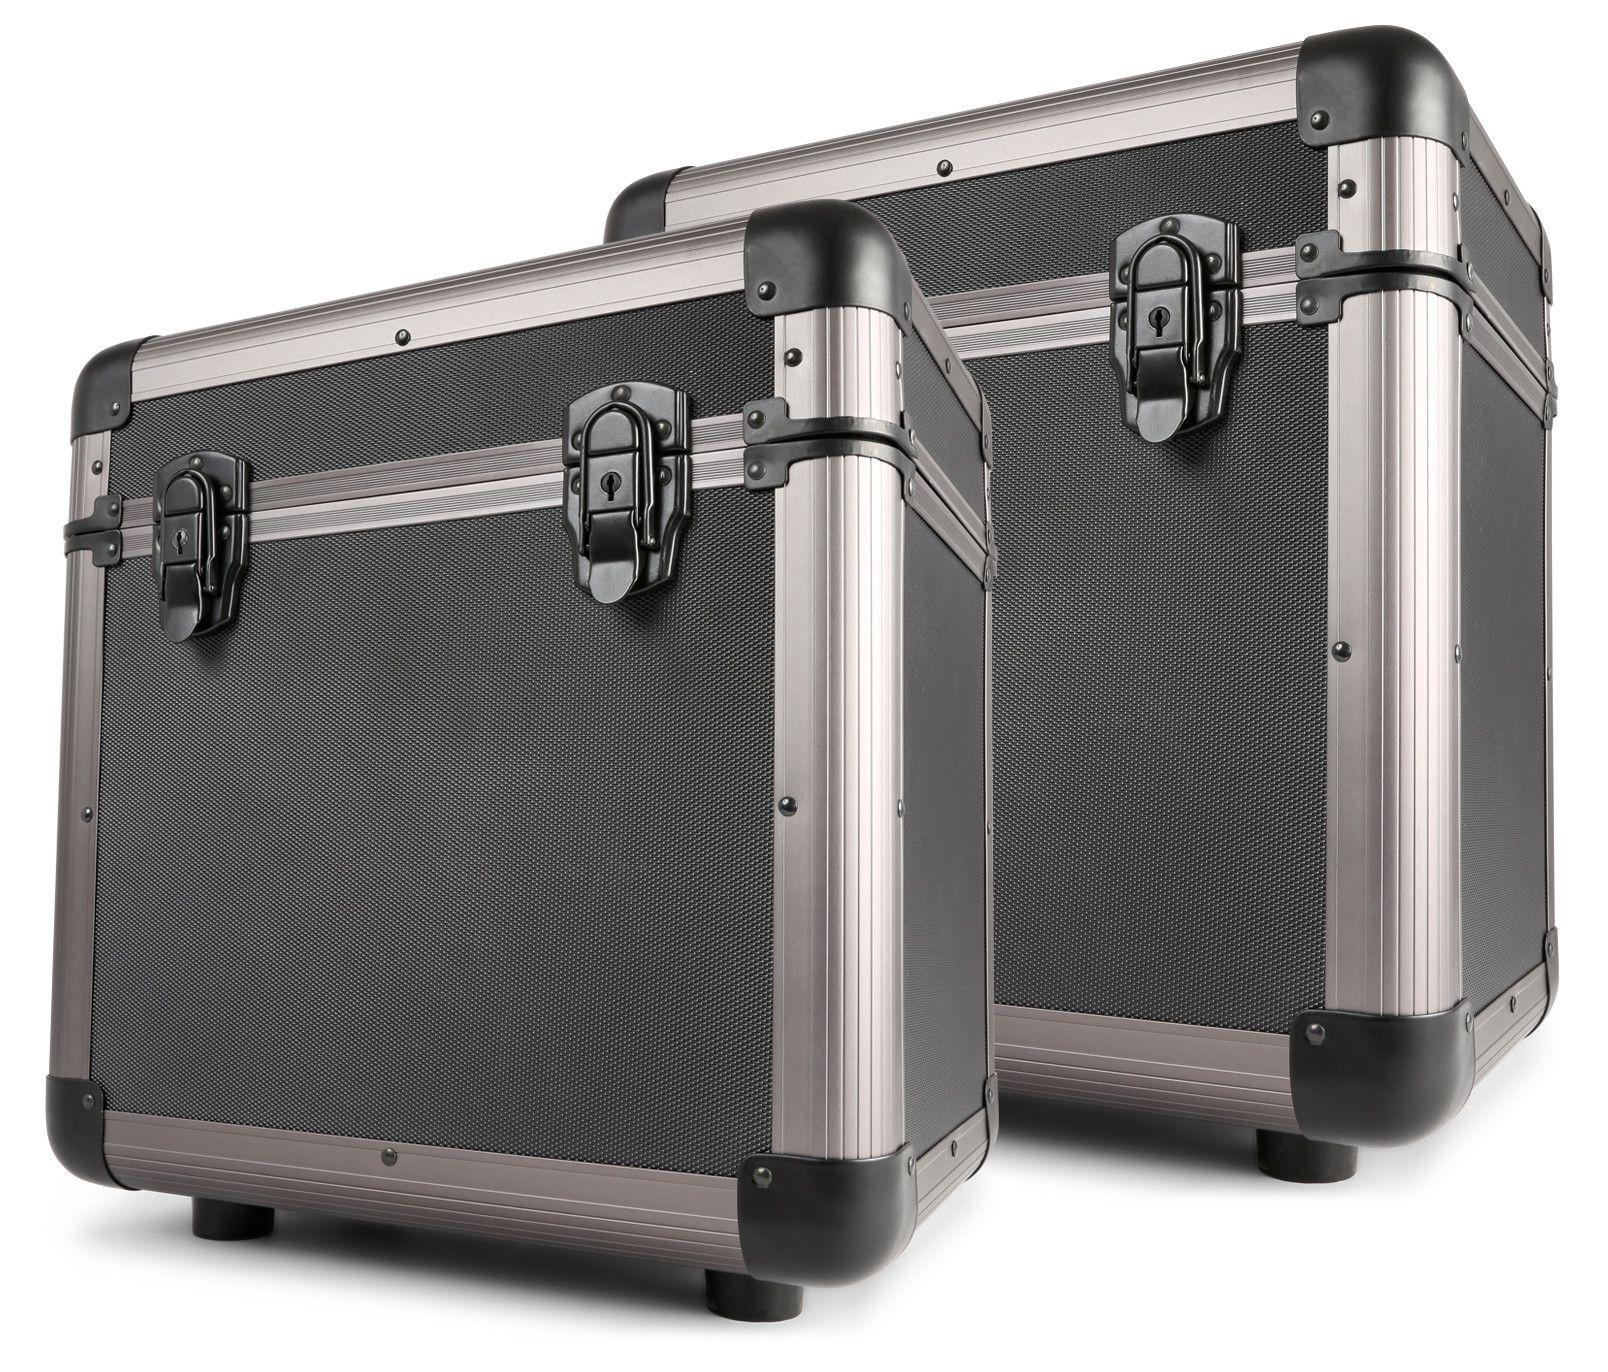 Set van 2 Power Dynamics RC80 12 platenkoffers titanium